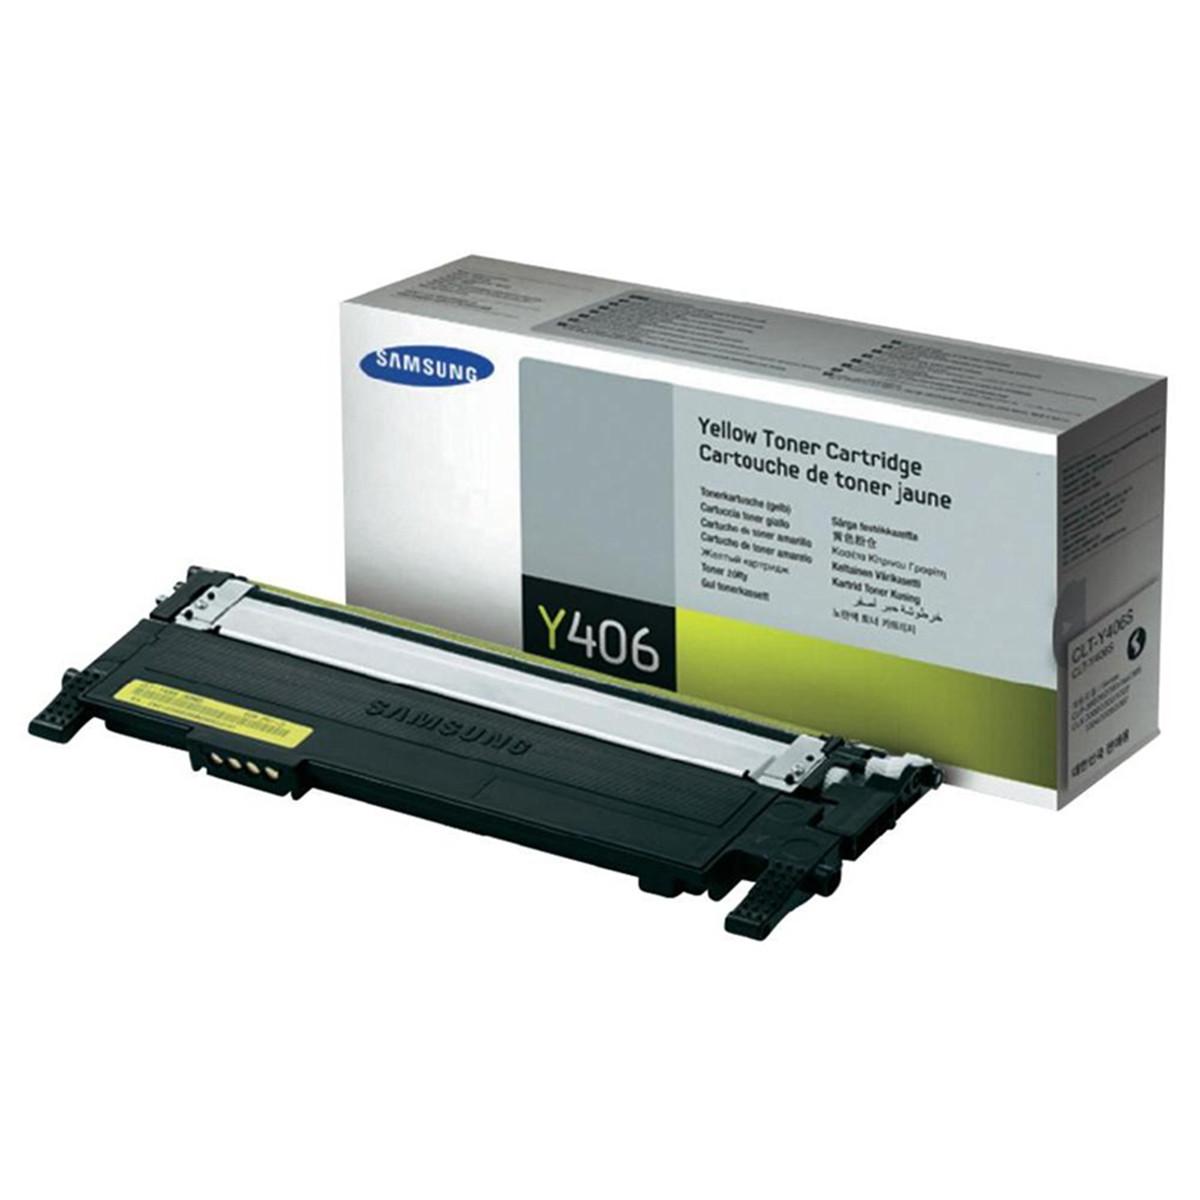 Toner Samsung CLT-Y406S Amarelo | CLP365W CLX3305 CLP365 C460W CLP360 C460FW C410W | Original 1k